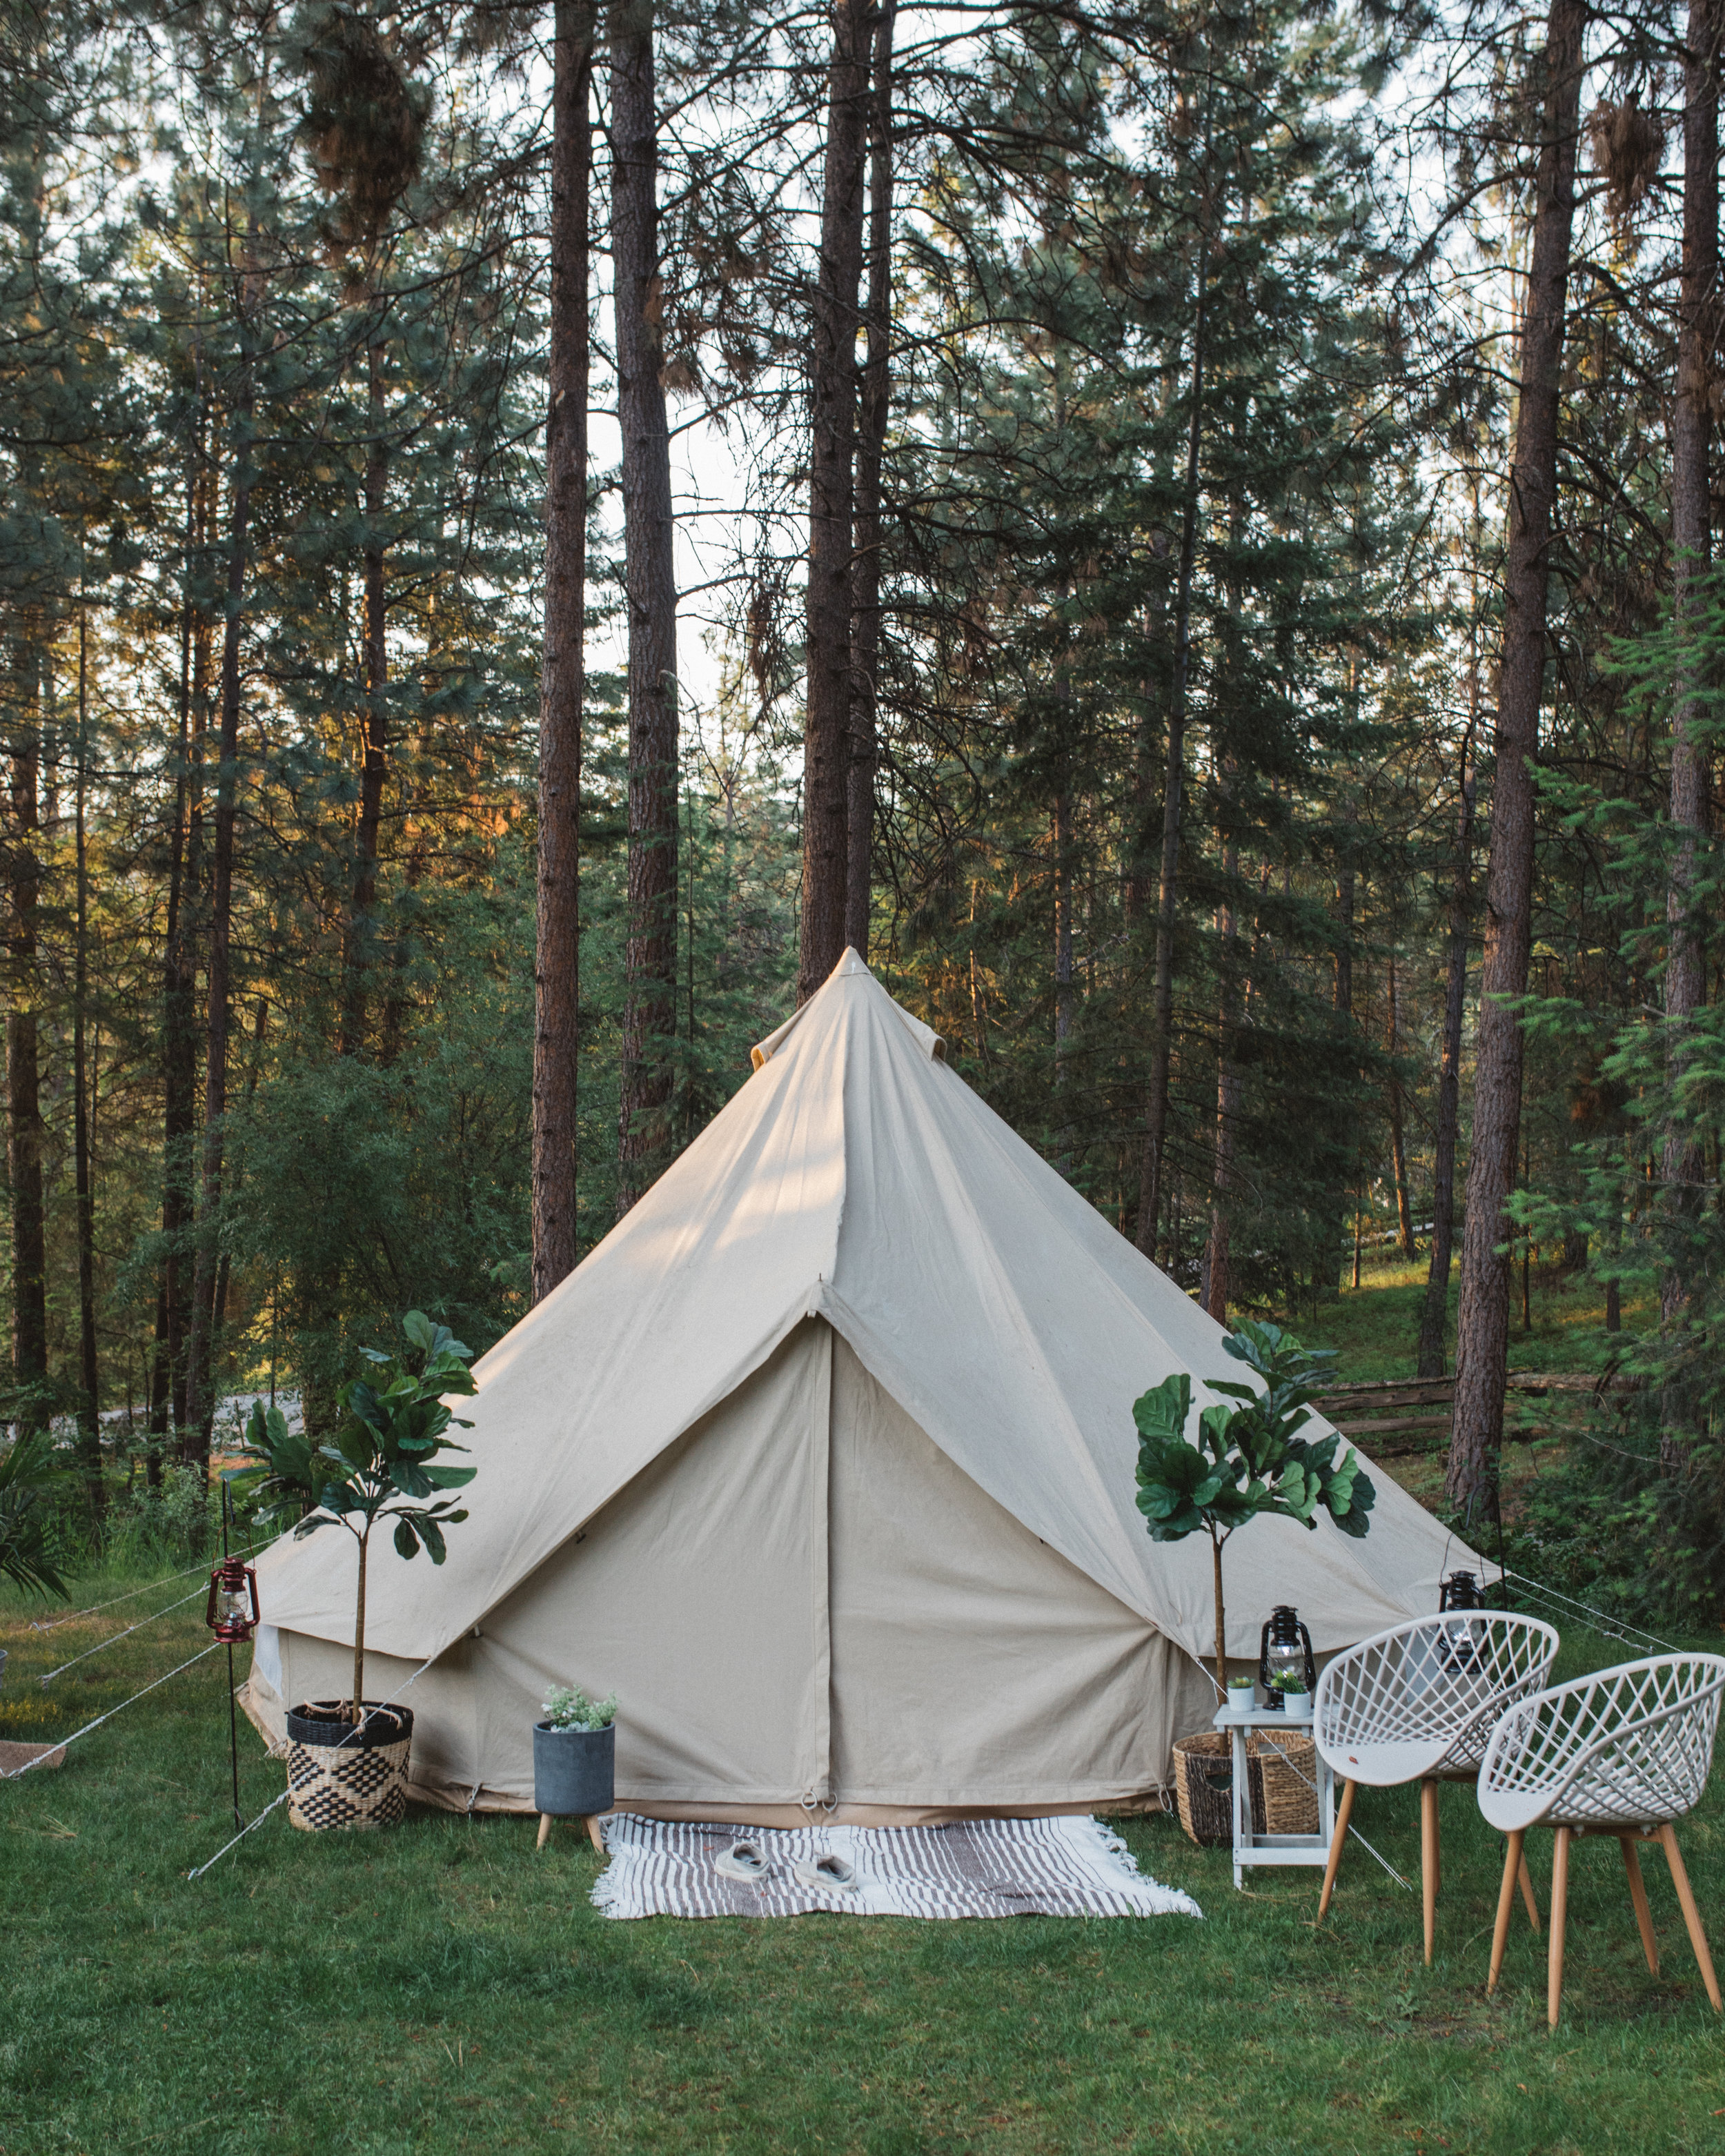 Glamping with Luxe Camping — Scott Bakken